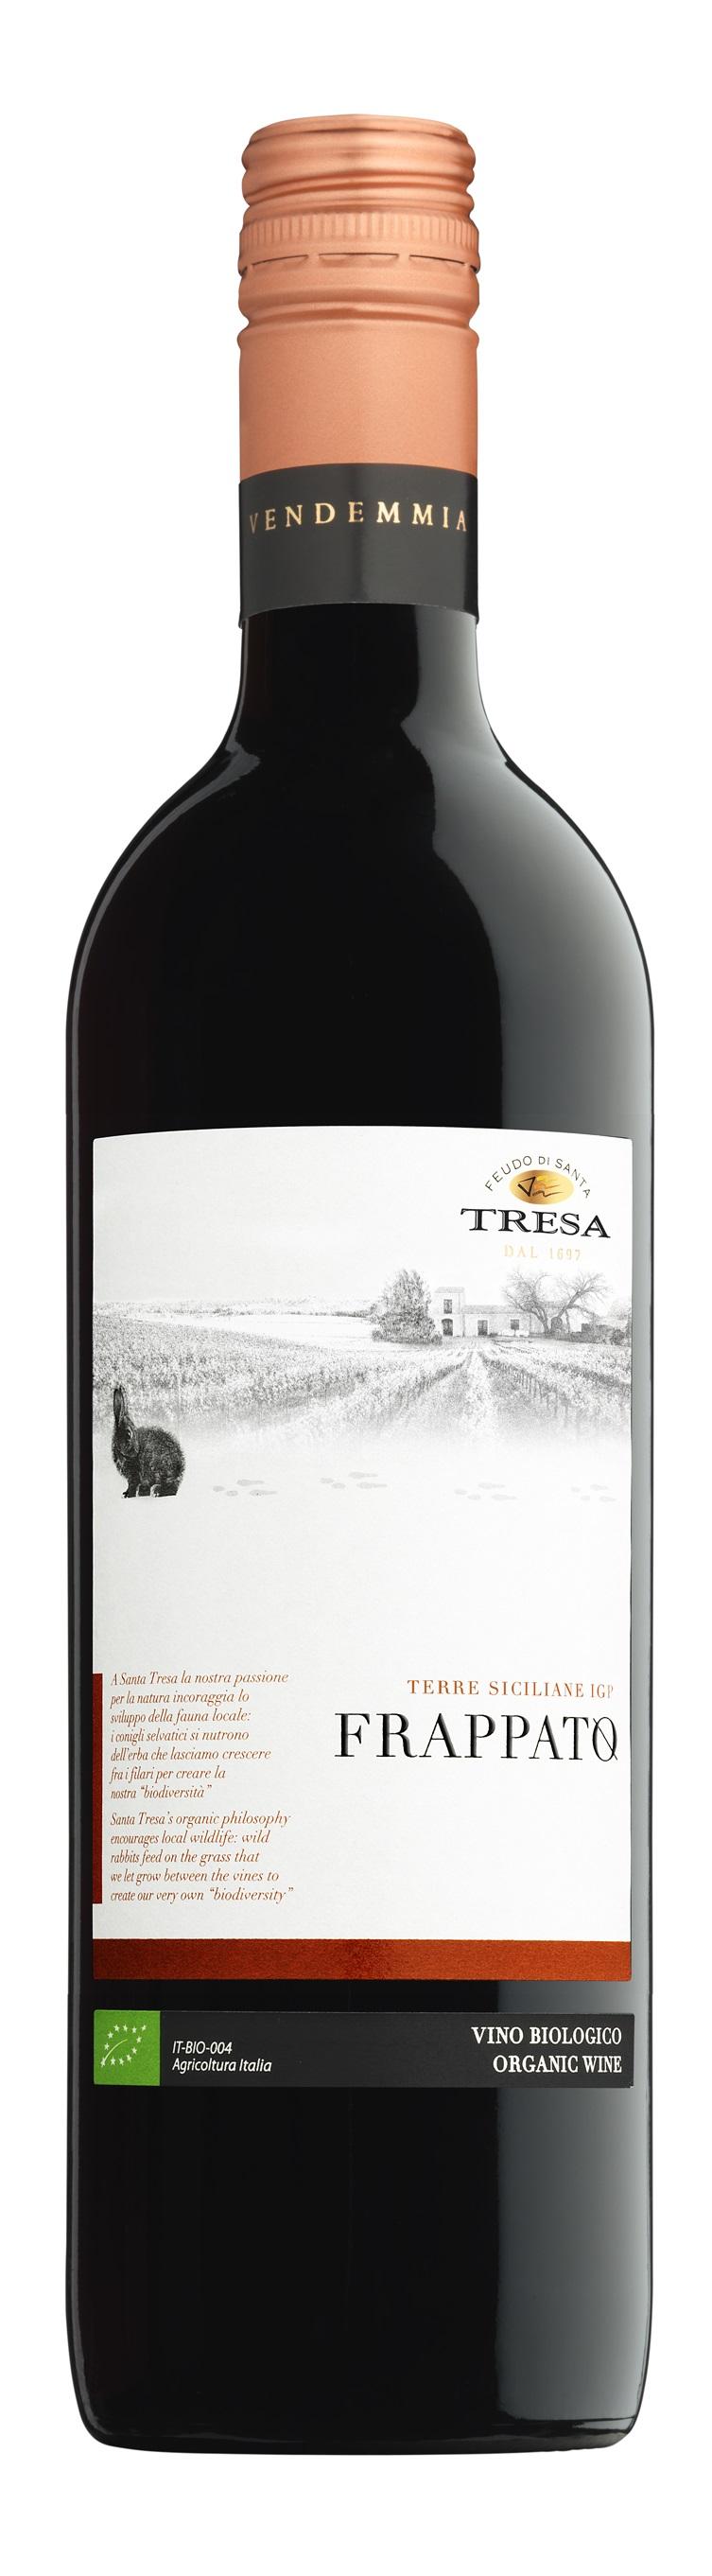 Santa Tresa Organic frappato